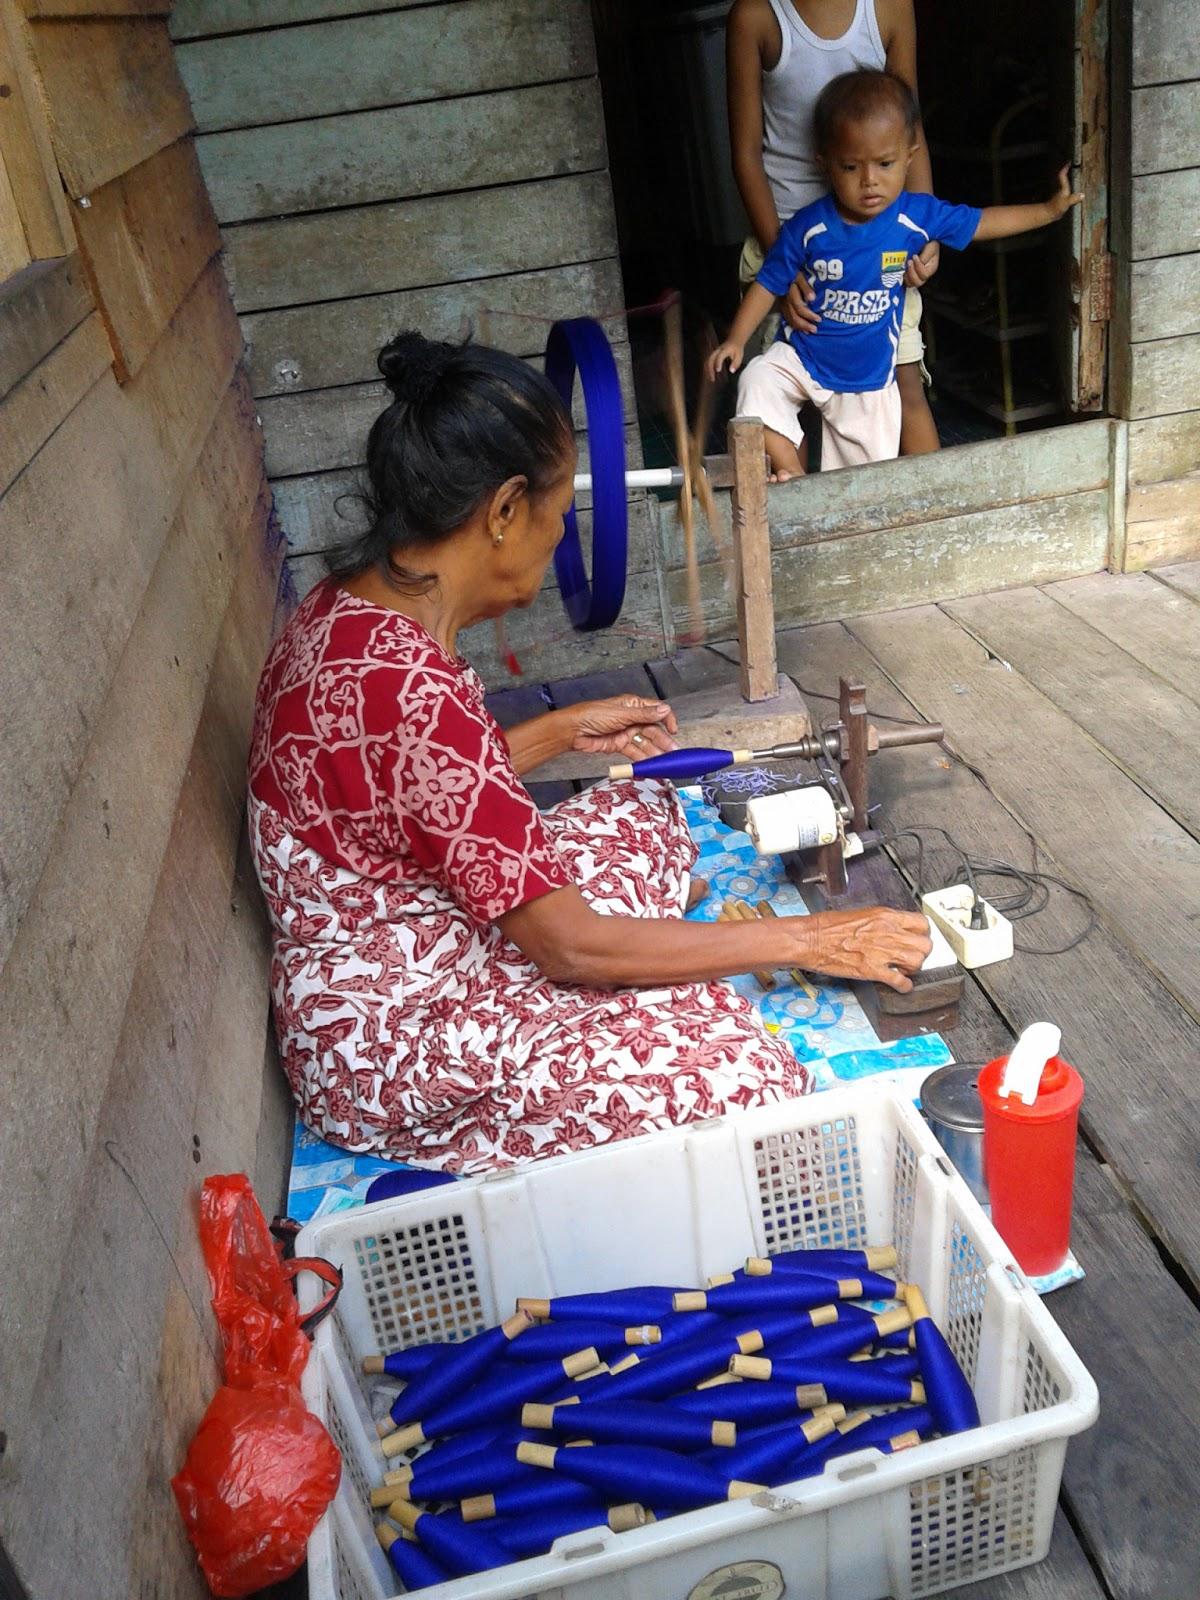 Kunjungan Sarung Tenun Samarinda Seberang Gambar Samping Proses Pemintalan Benang